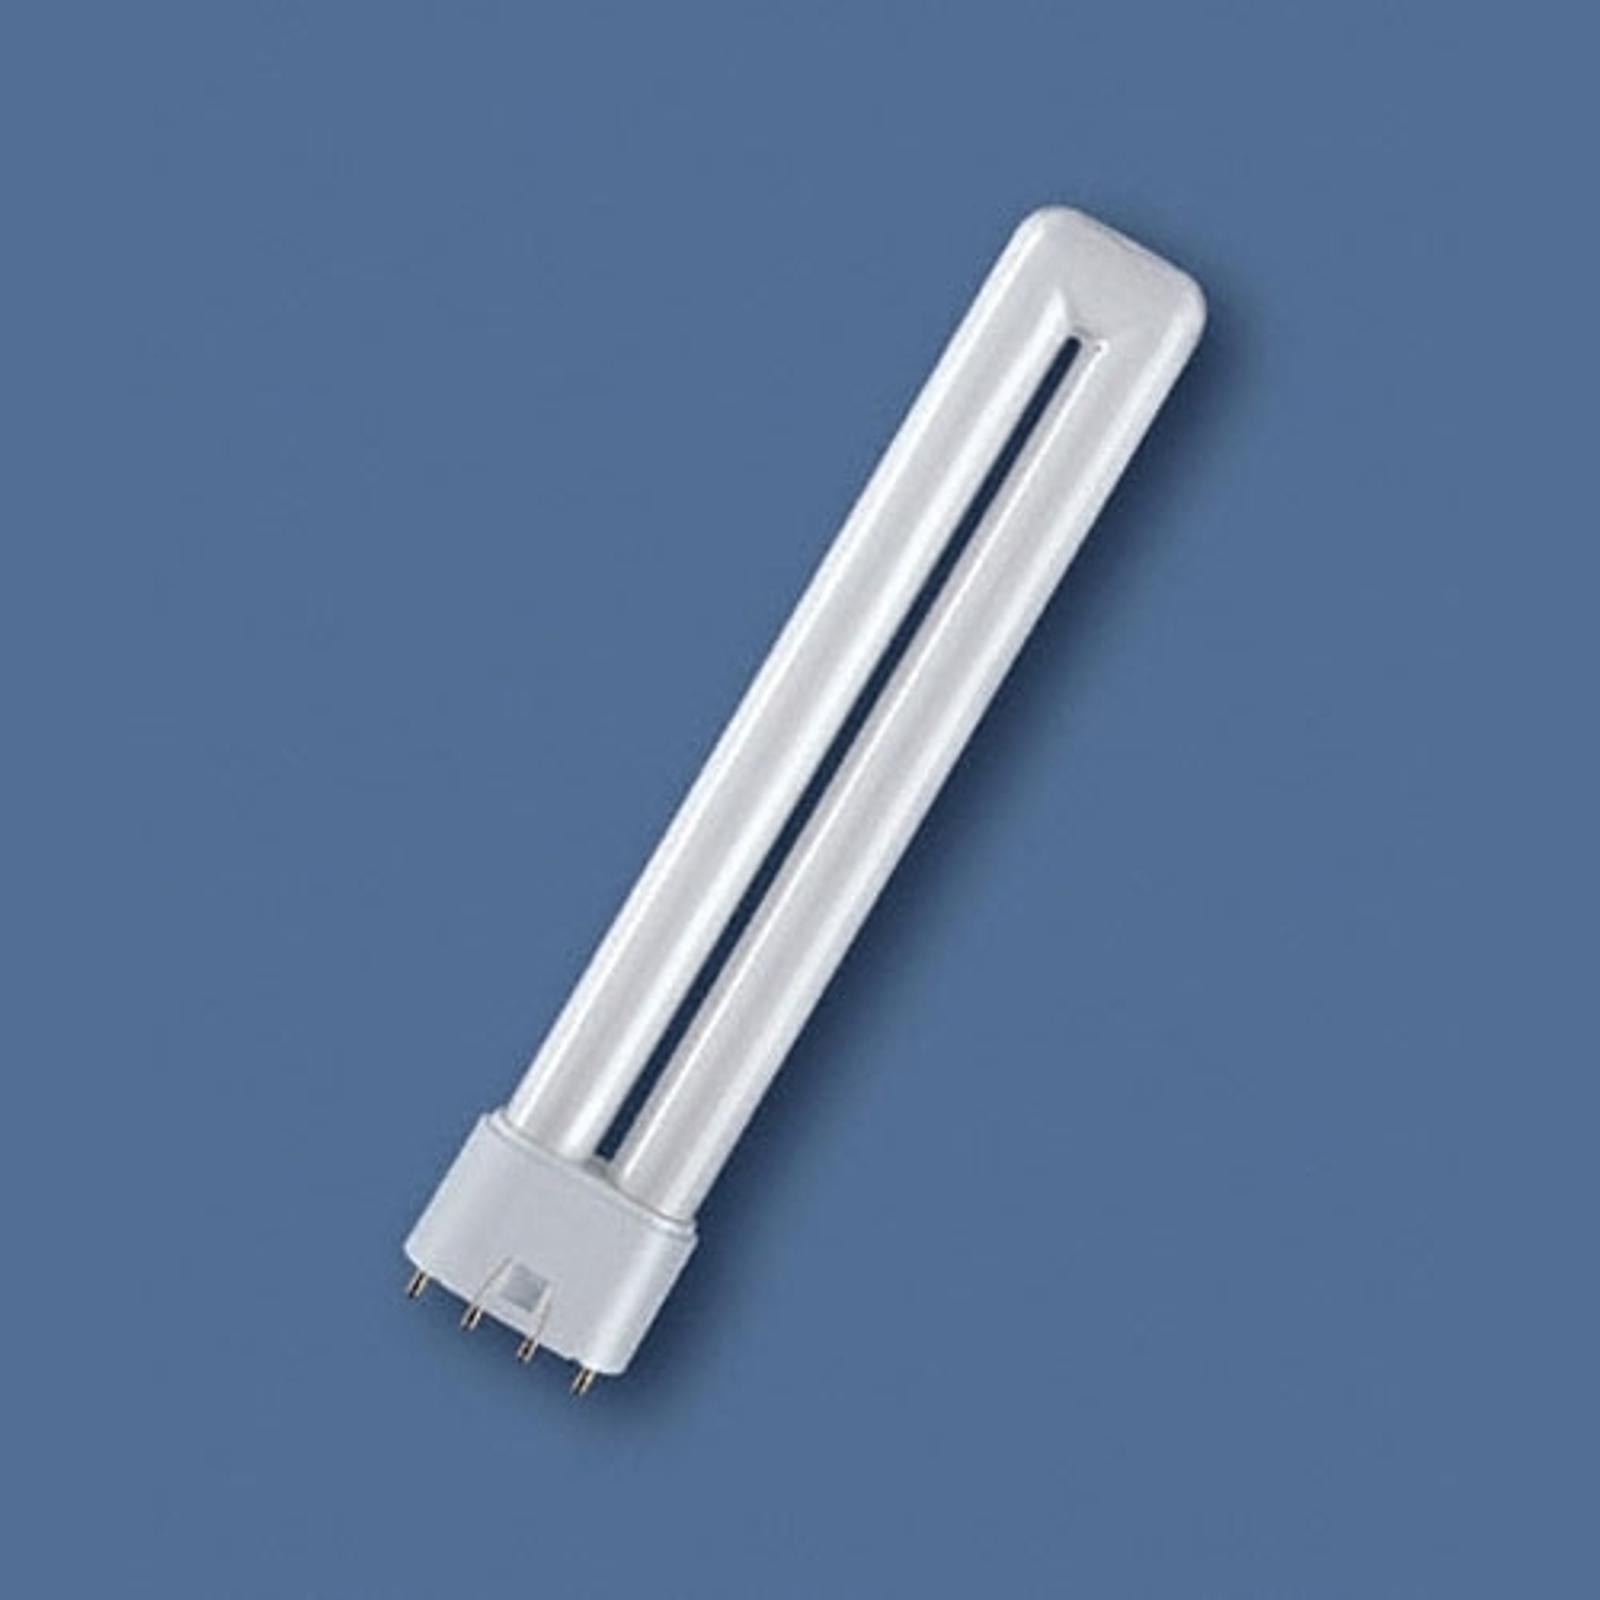 2G11 36W 830 Dulux L -pienloistelamppu